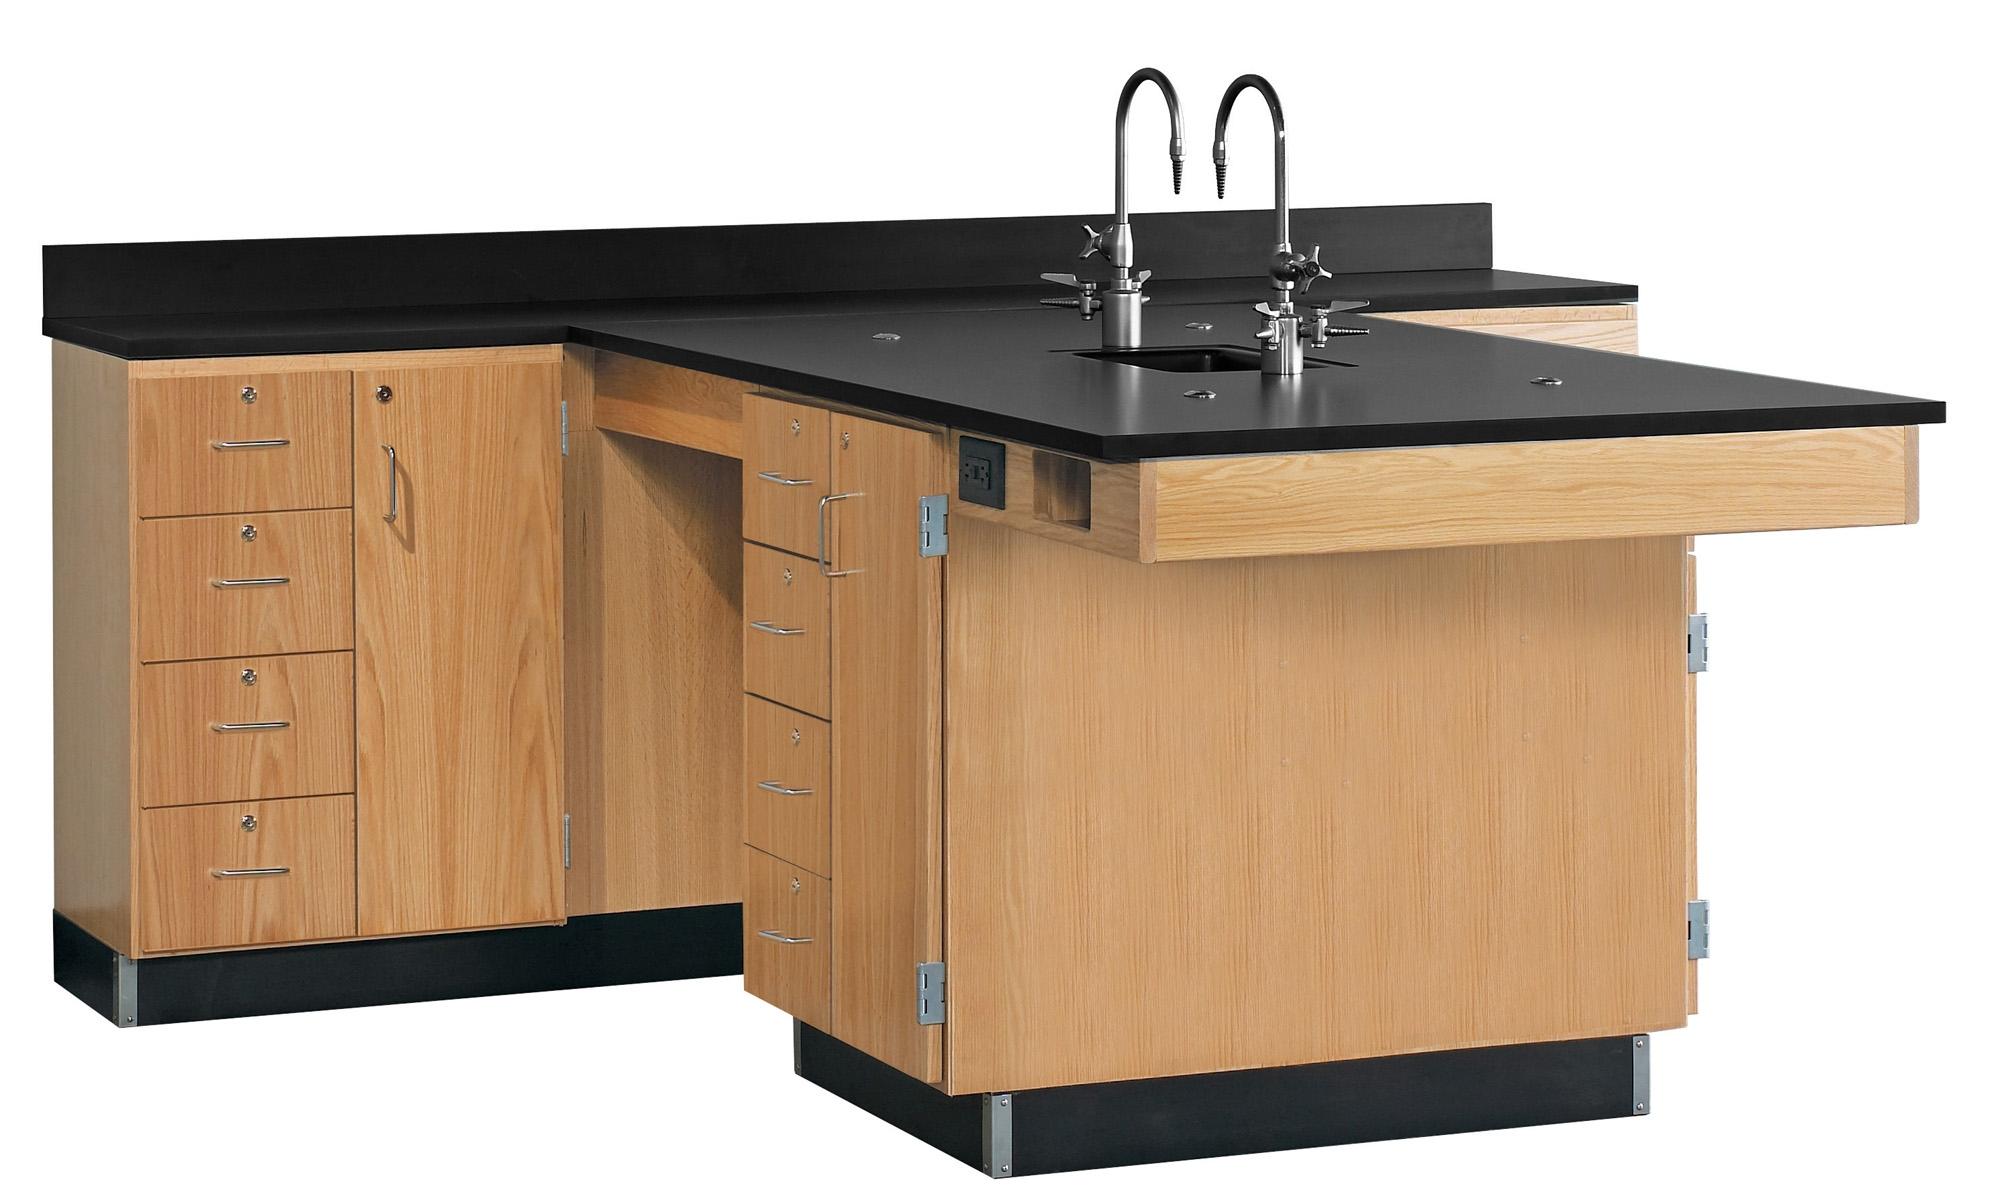 Diversified Woodcrafts Perimeter Workstation, Multi-Storage Unit - Epoxy Top